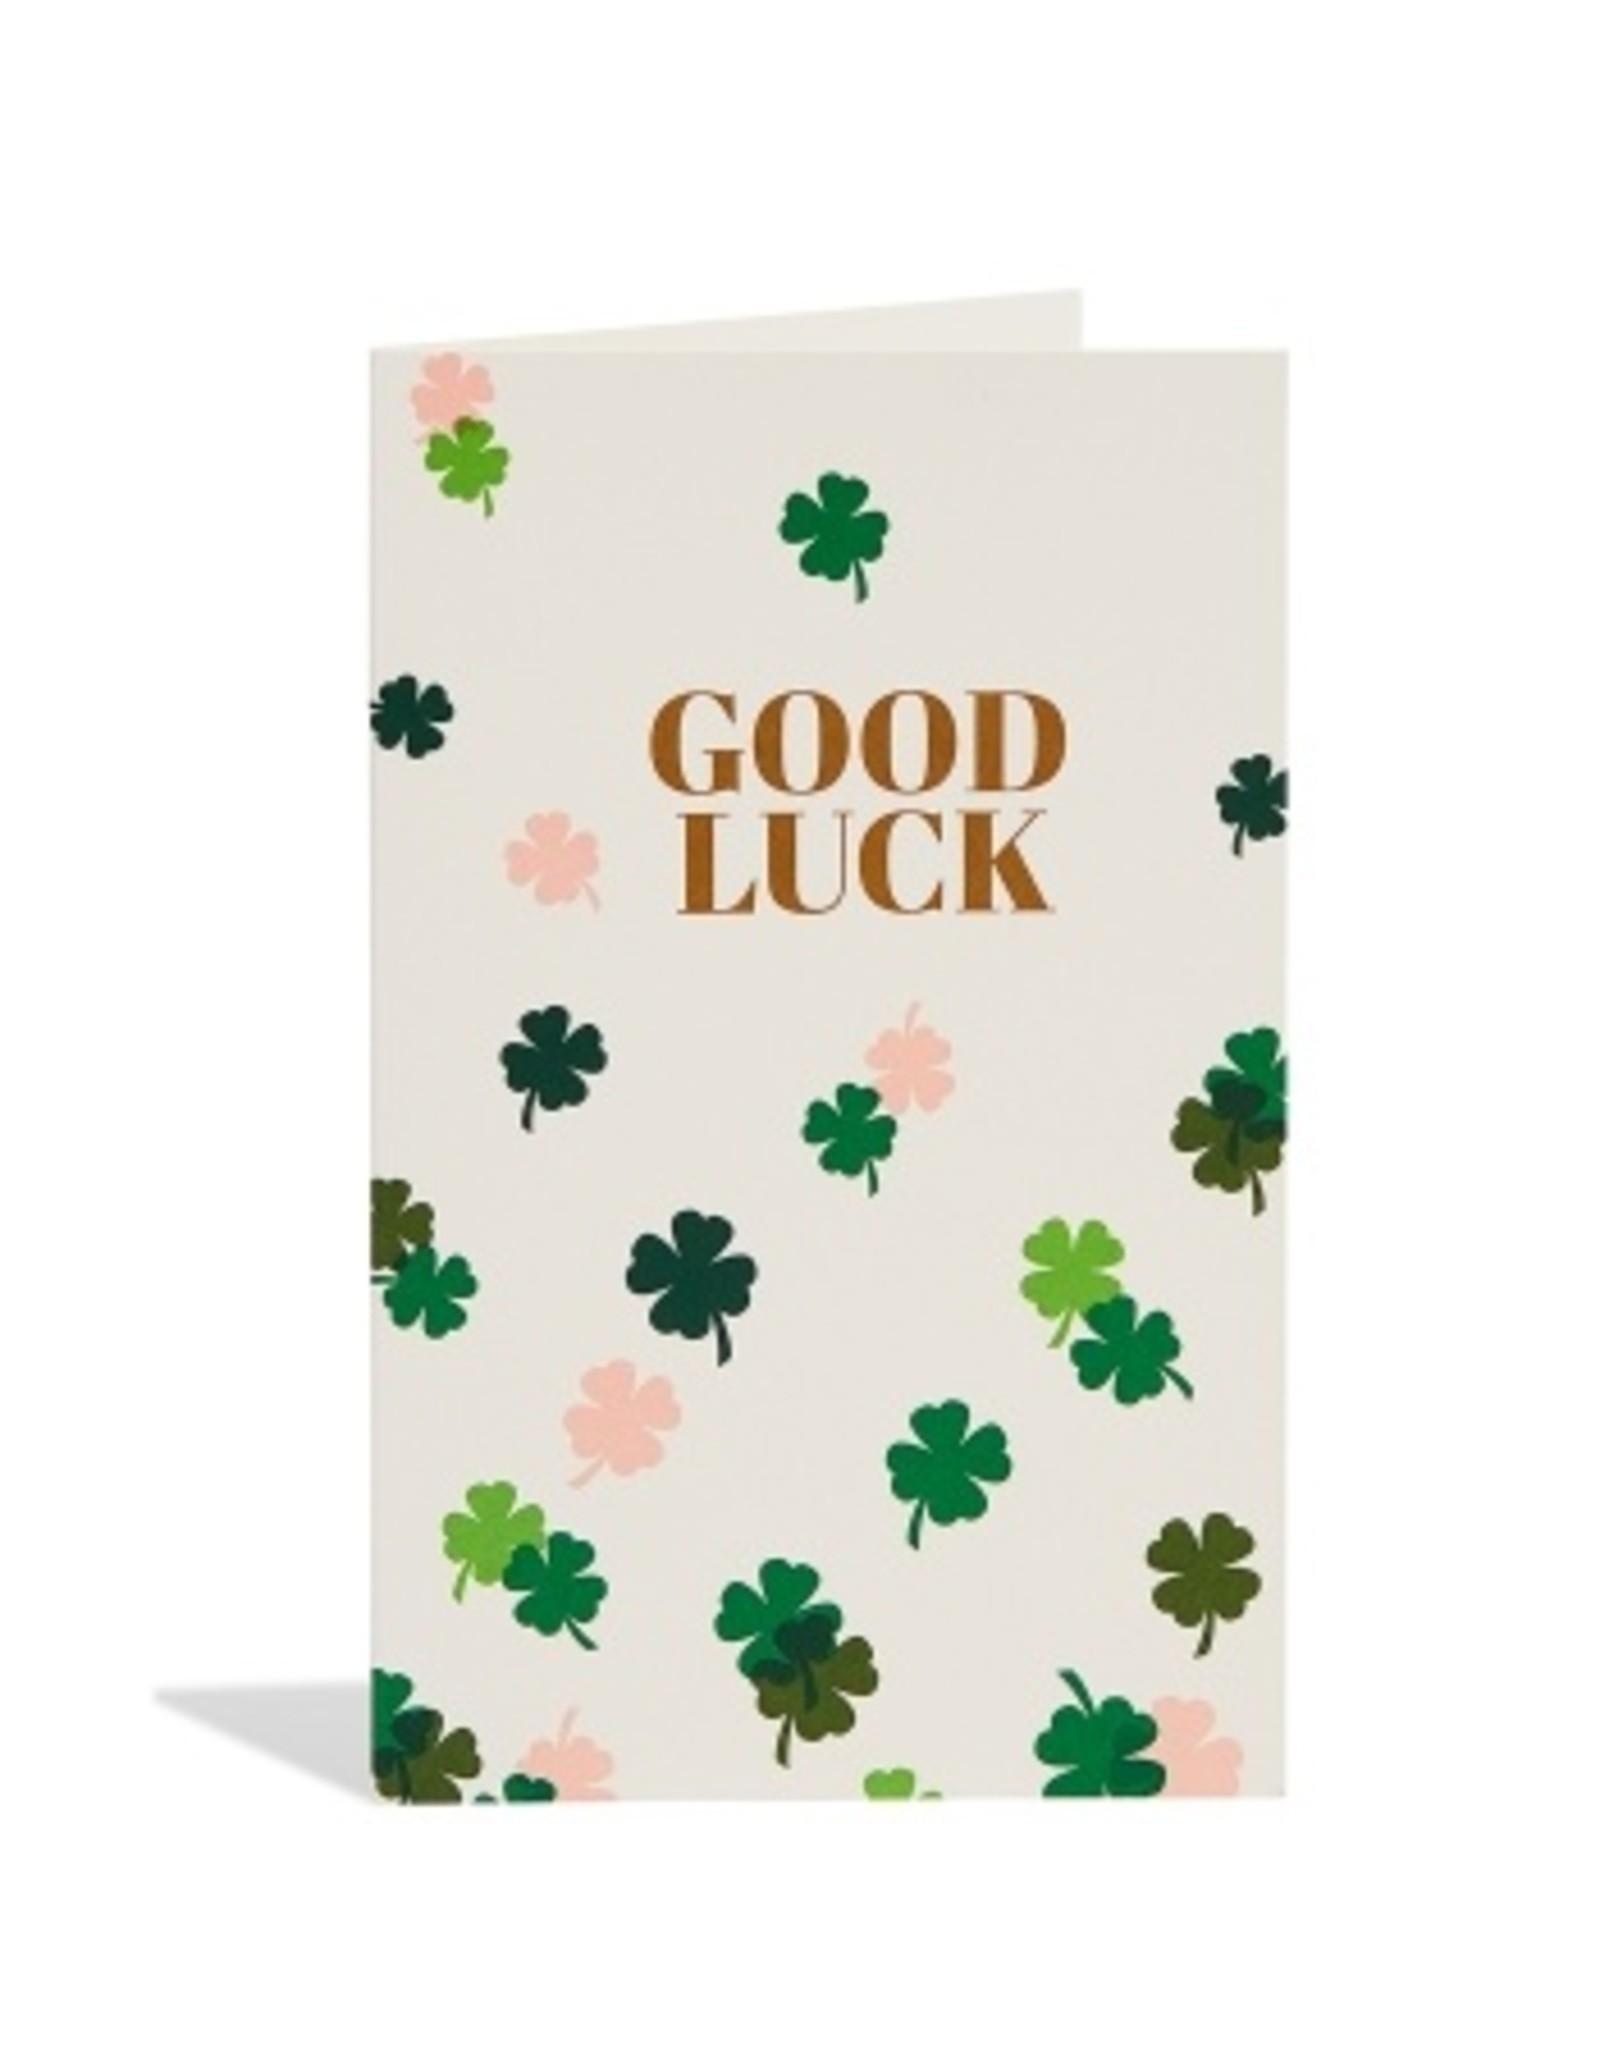 Snow & Graham Good Luck Clovers Card